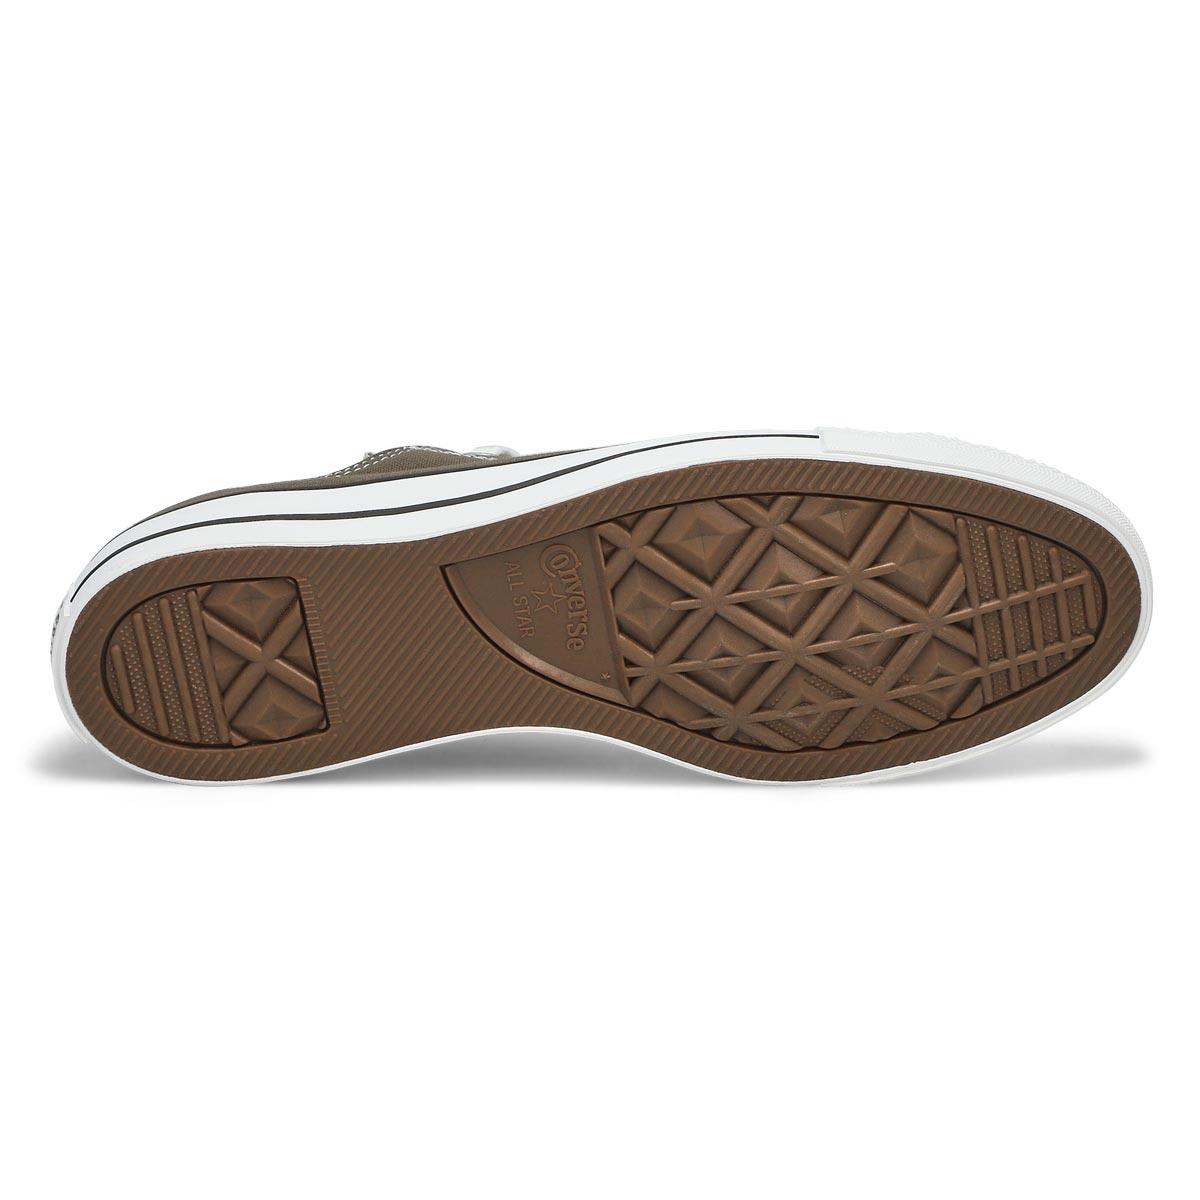 Men's CTAS Core Ox sneakers - charcoal